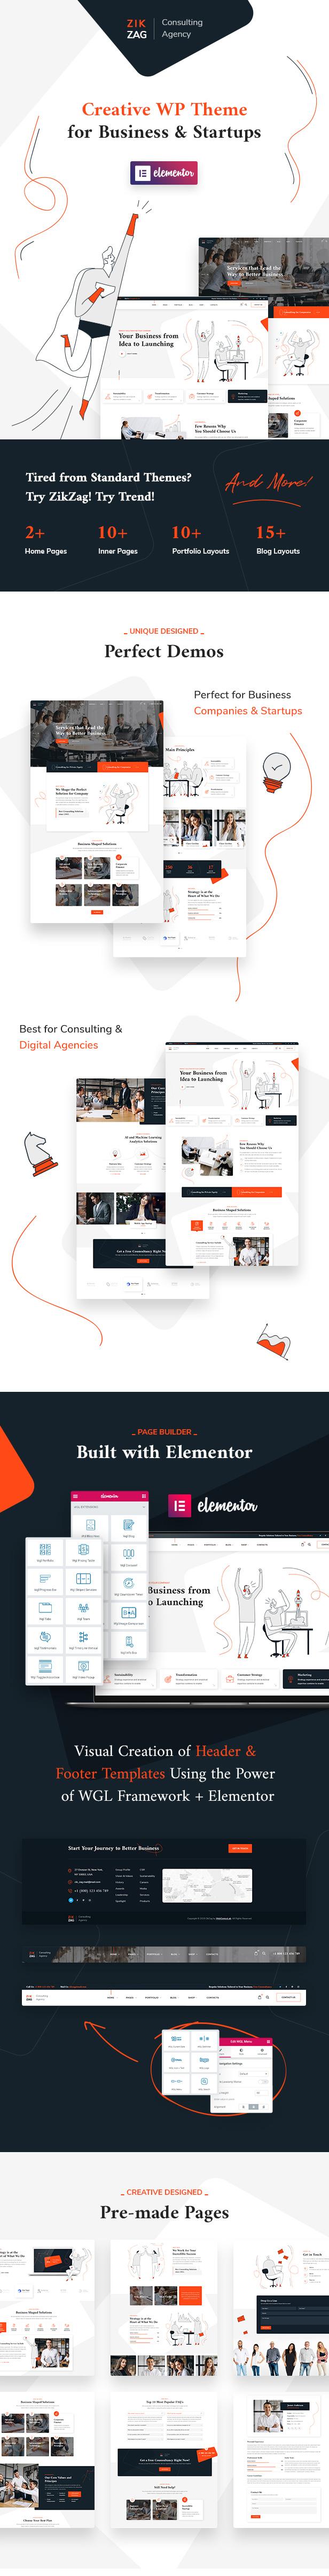 ZikZag - Consulting & Agency WordPress Theme - 1